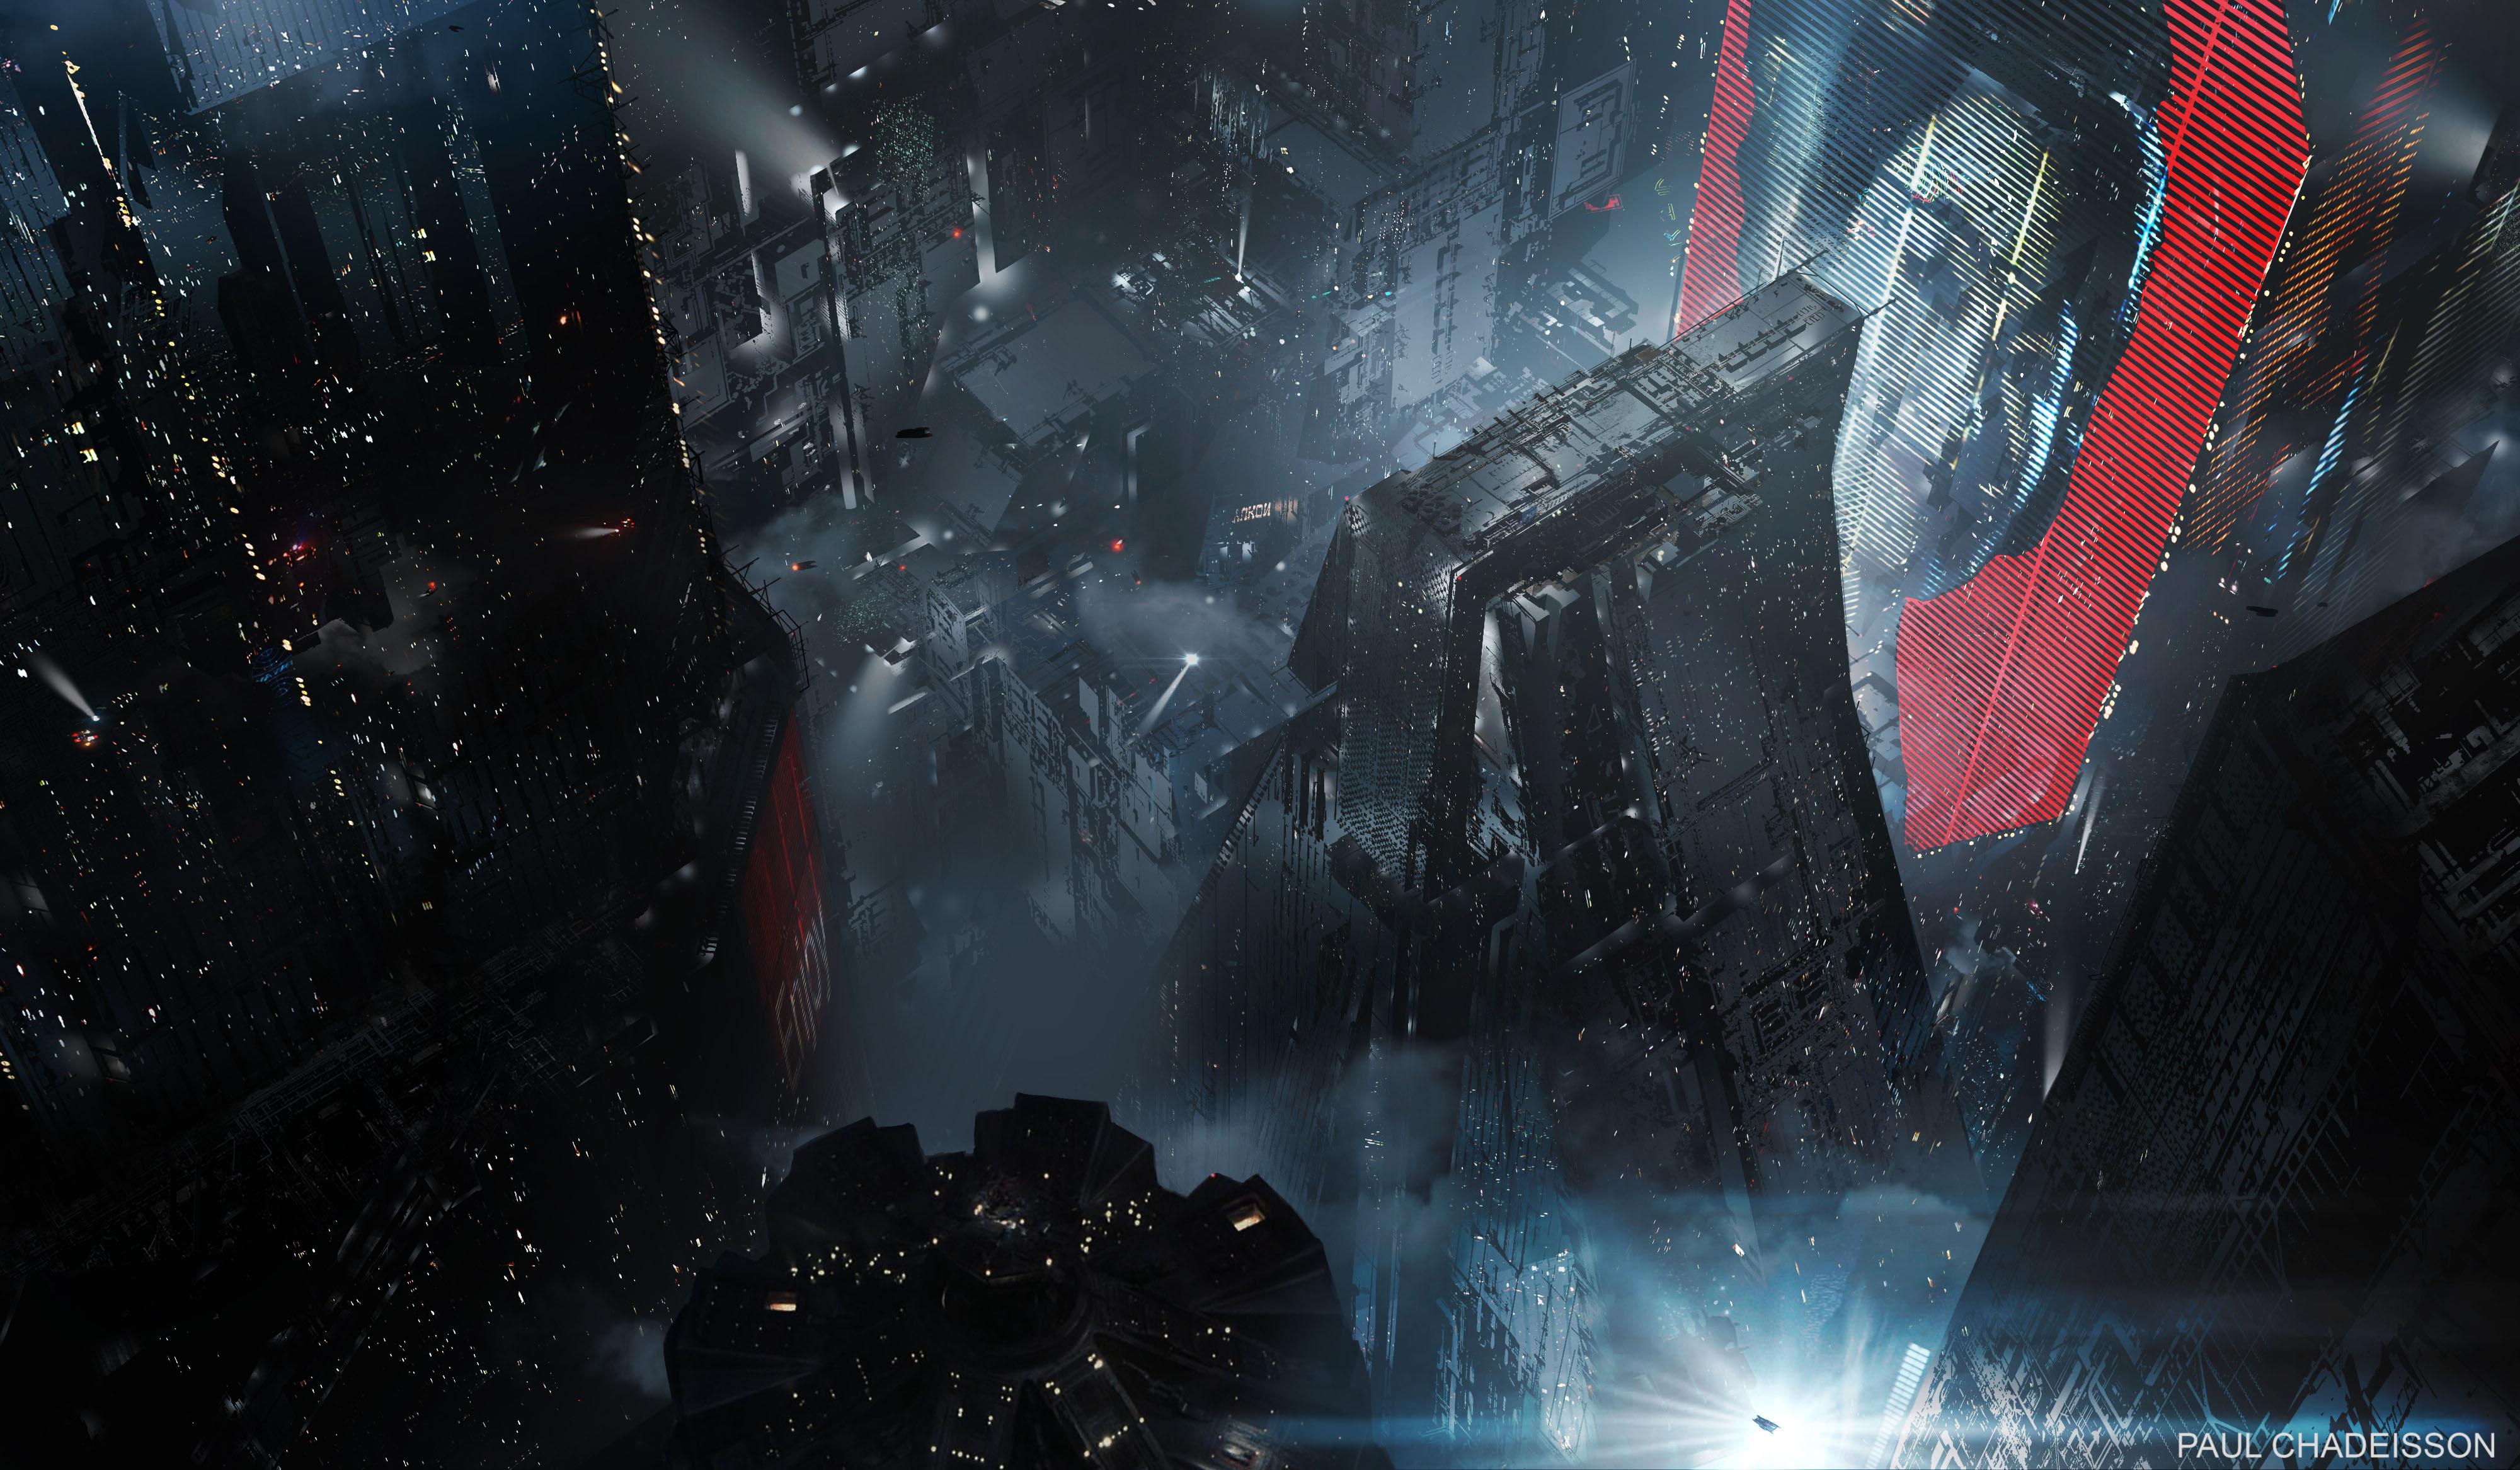 blade runner wallpaper  73 Blade Runner 2049 HD Wallpapers   Background Images - Wallpaper Abyss